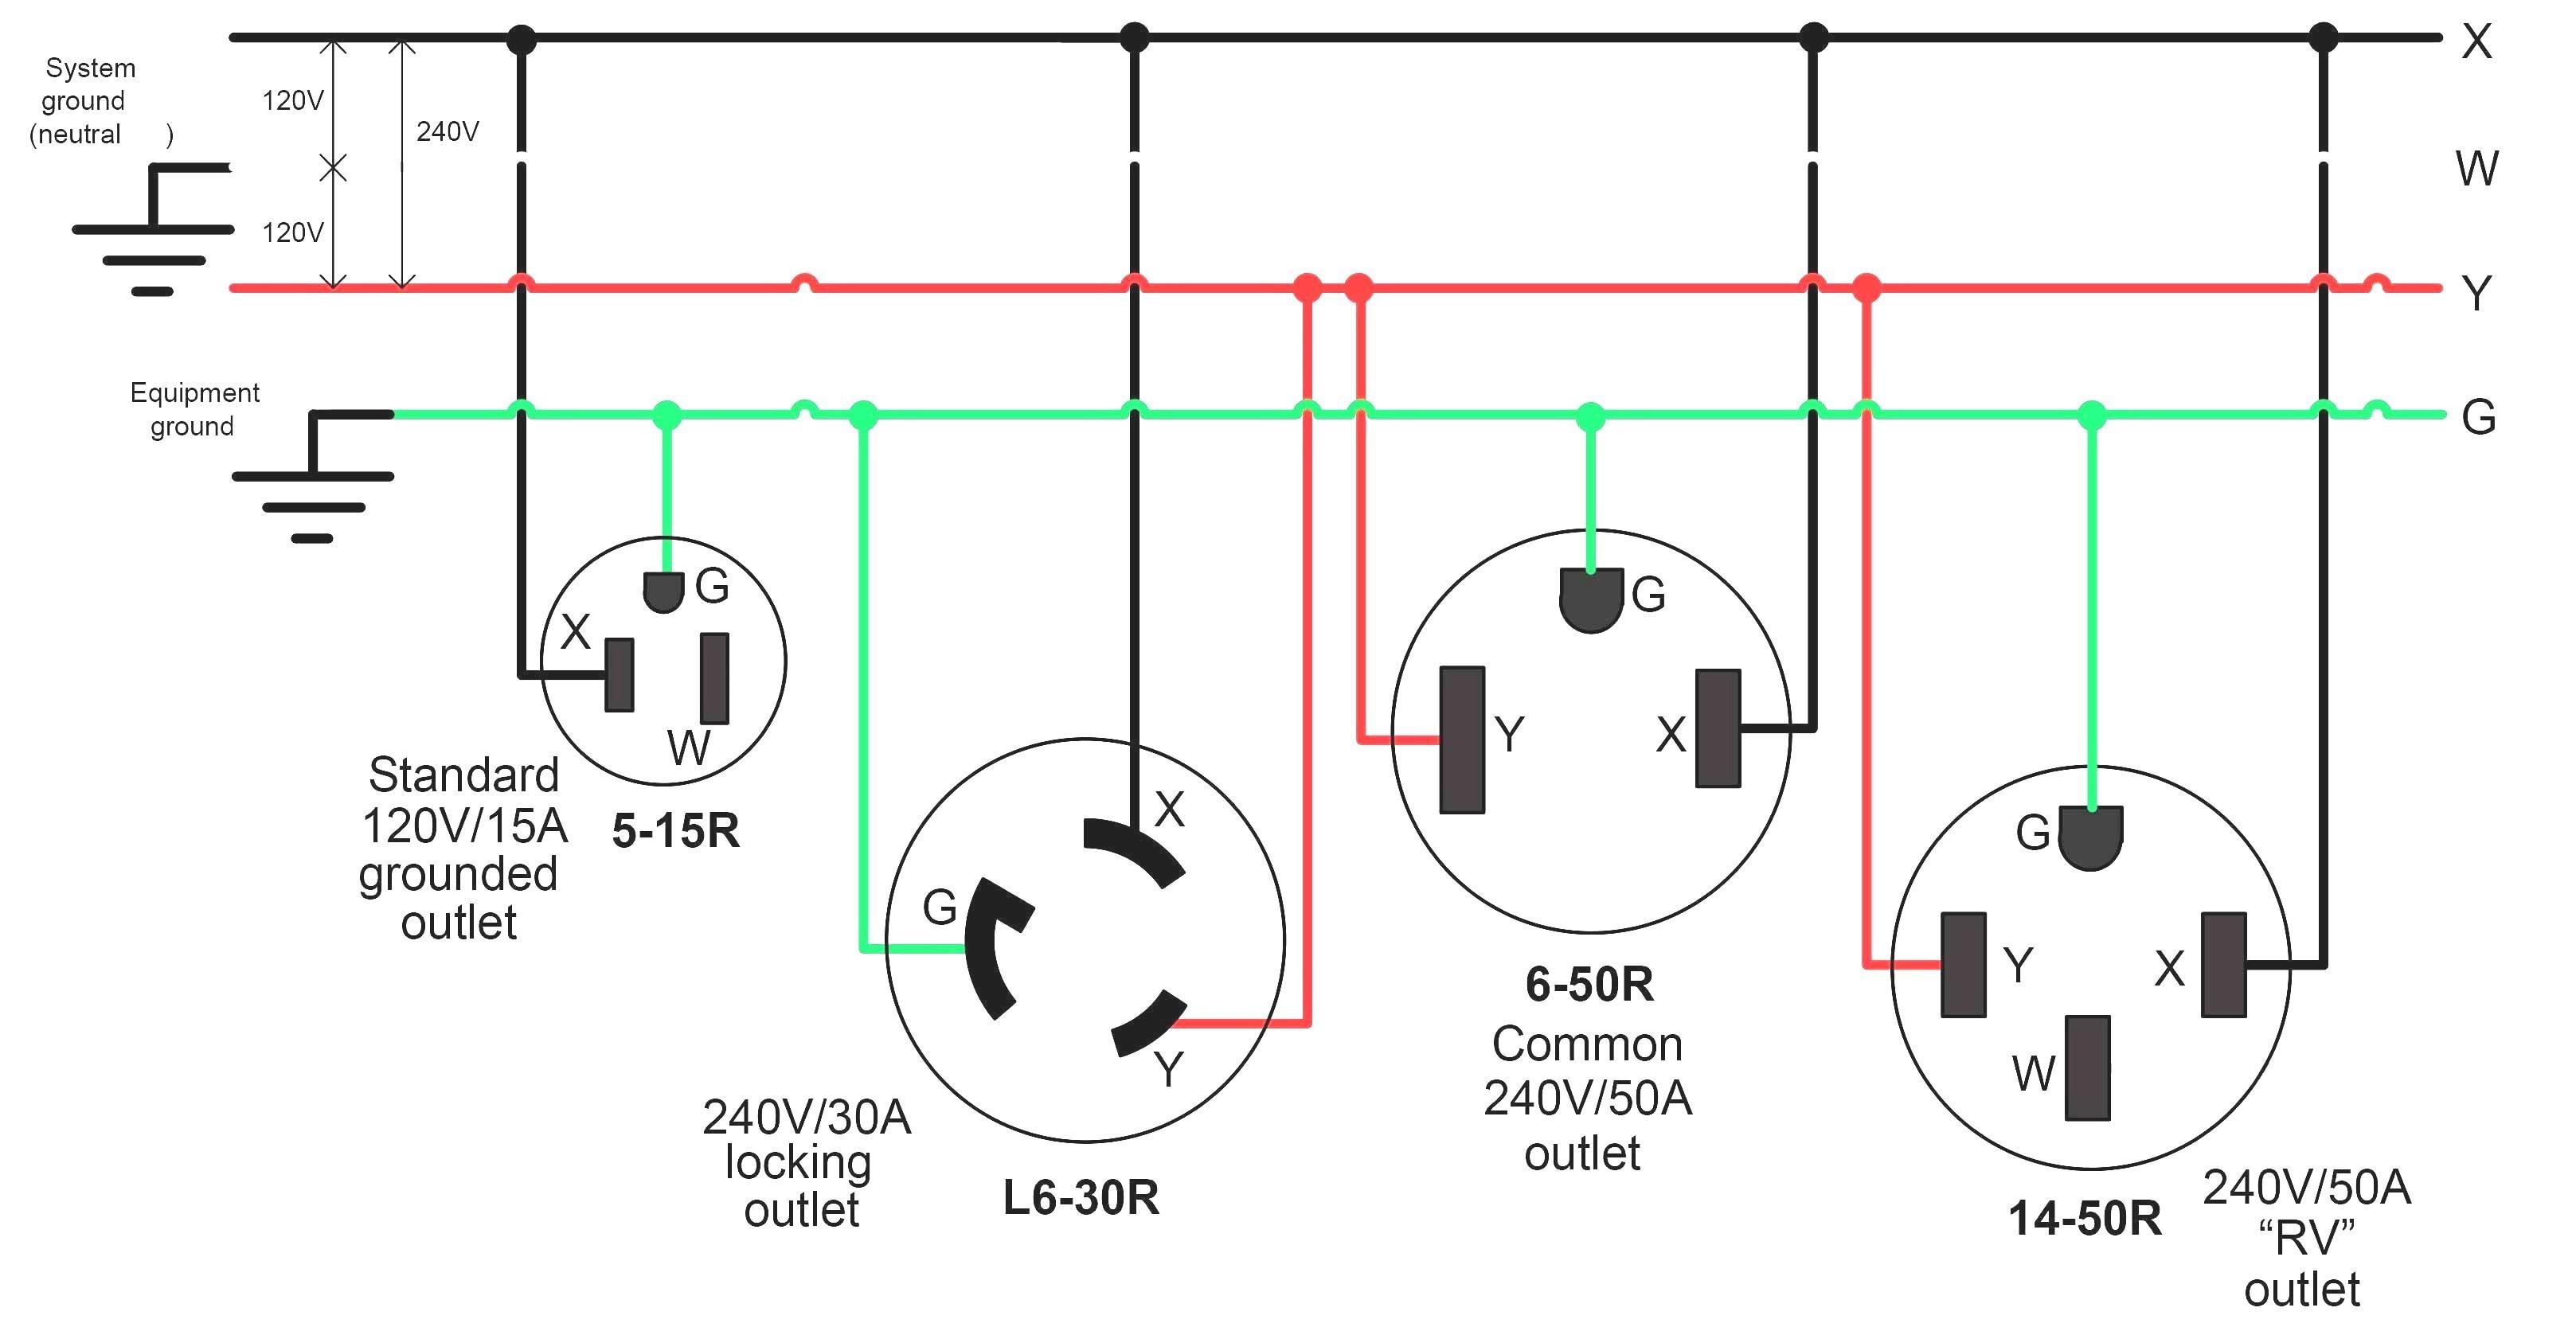 wiring 220 230 diagram motor aerotechfan electrical wire symbol rh viewdress com 220 440 Motor Wiring Diagram 220 Volt Compressor Motor Wiring